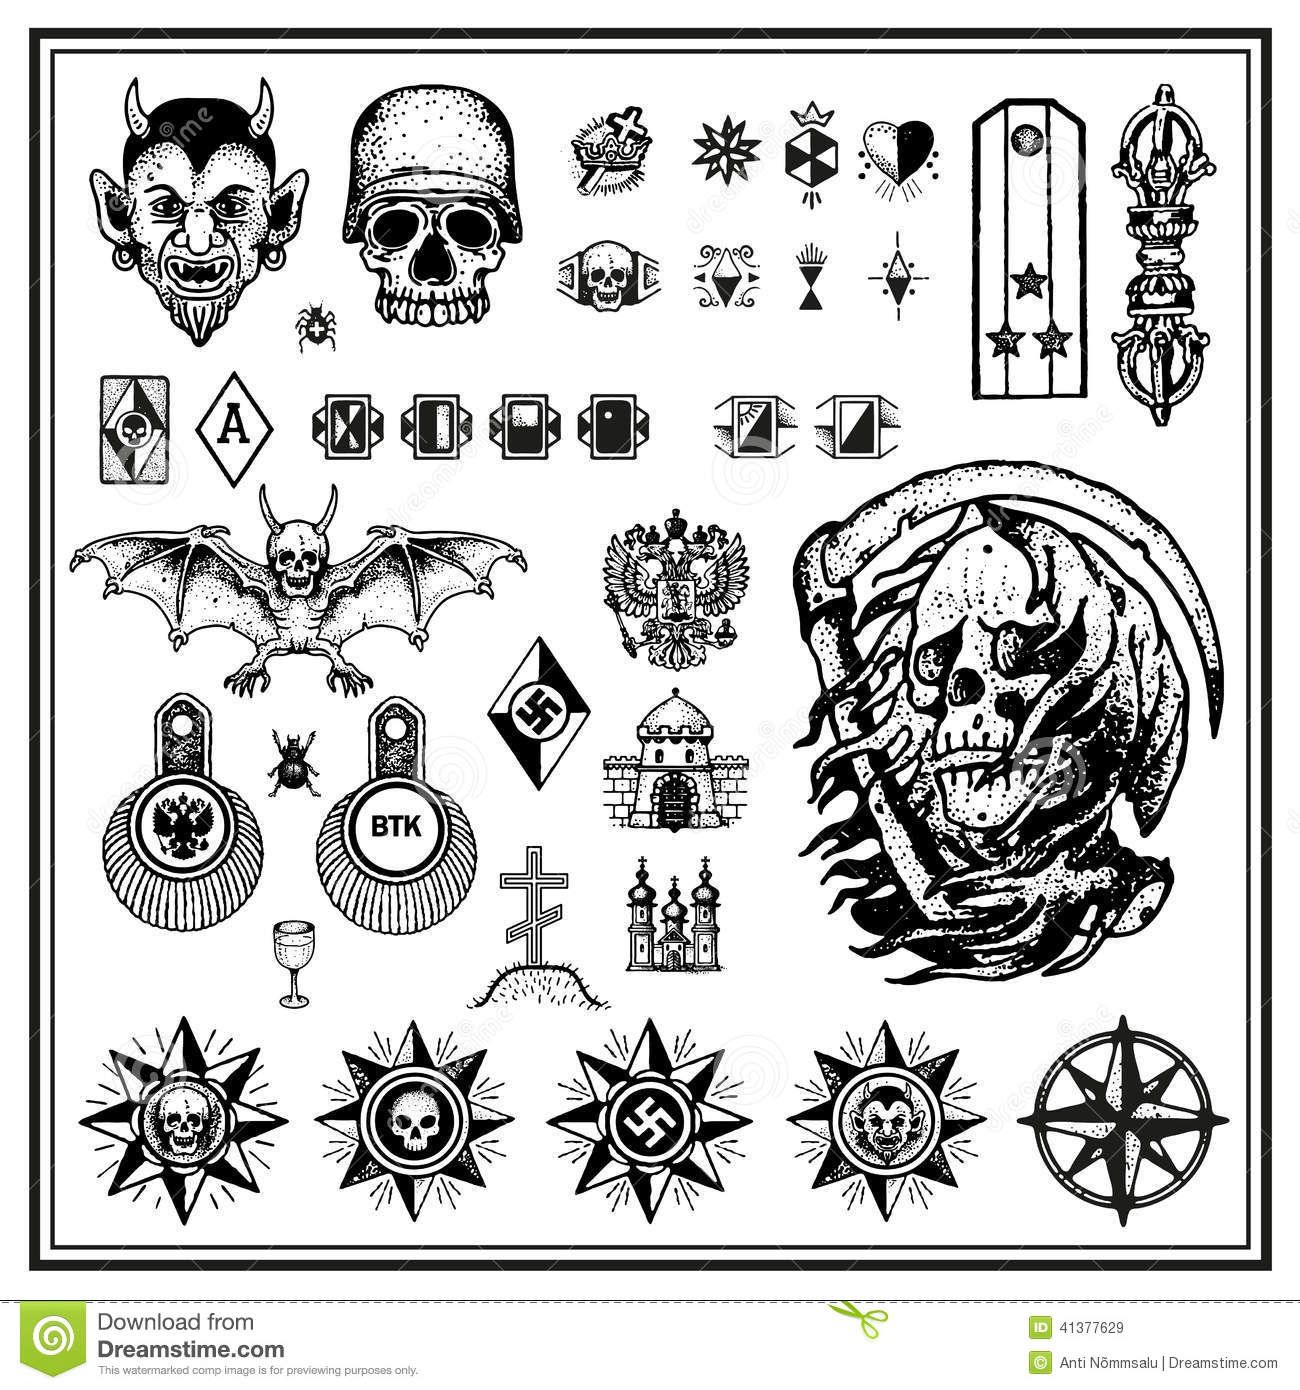 Russian Tattoo In Bilder Suchen Swisscows Tattoos Pinterest